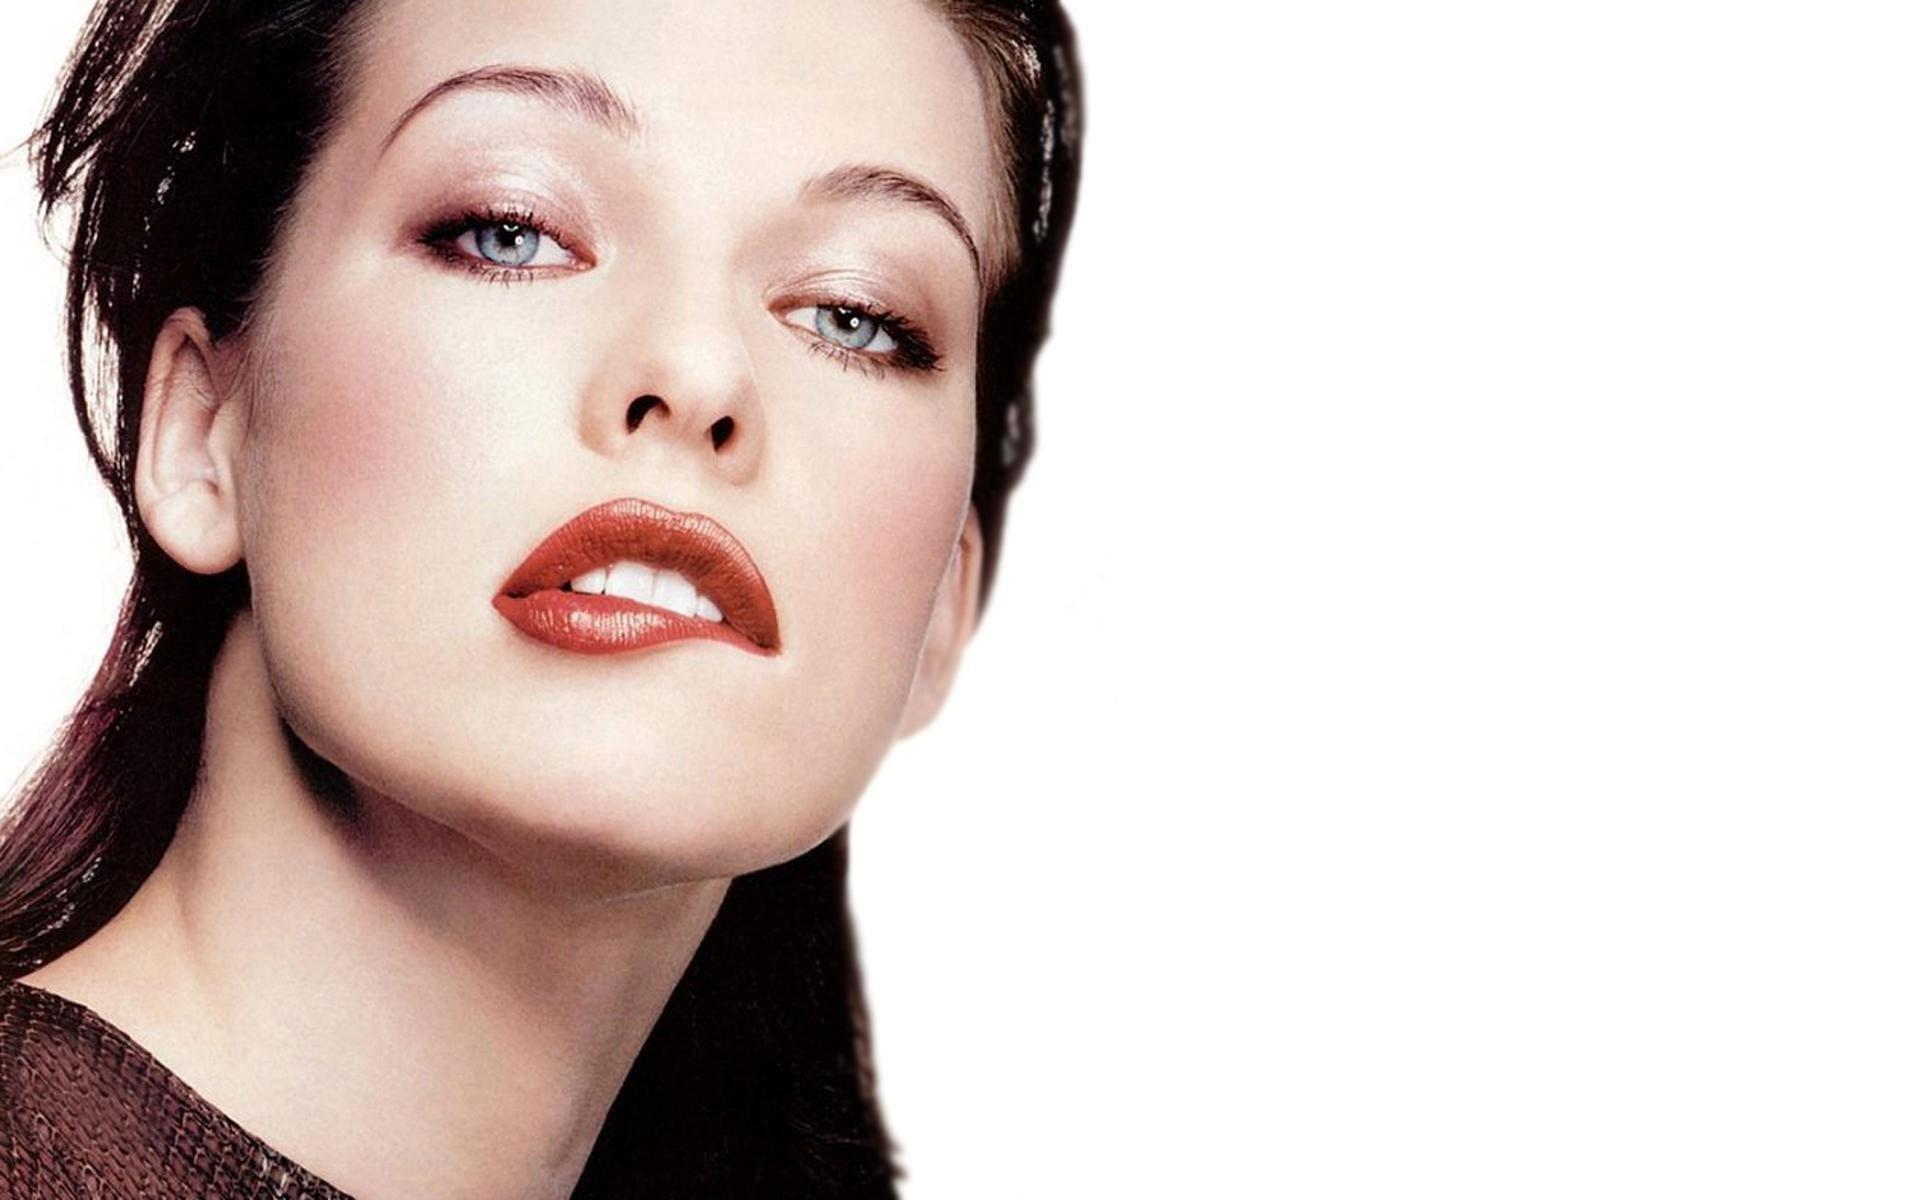 Wallpaper : Face, Model, Milla Jovovich, Makeup, Celebrity